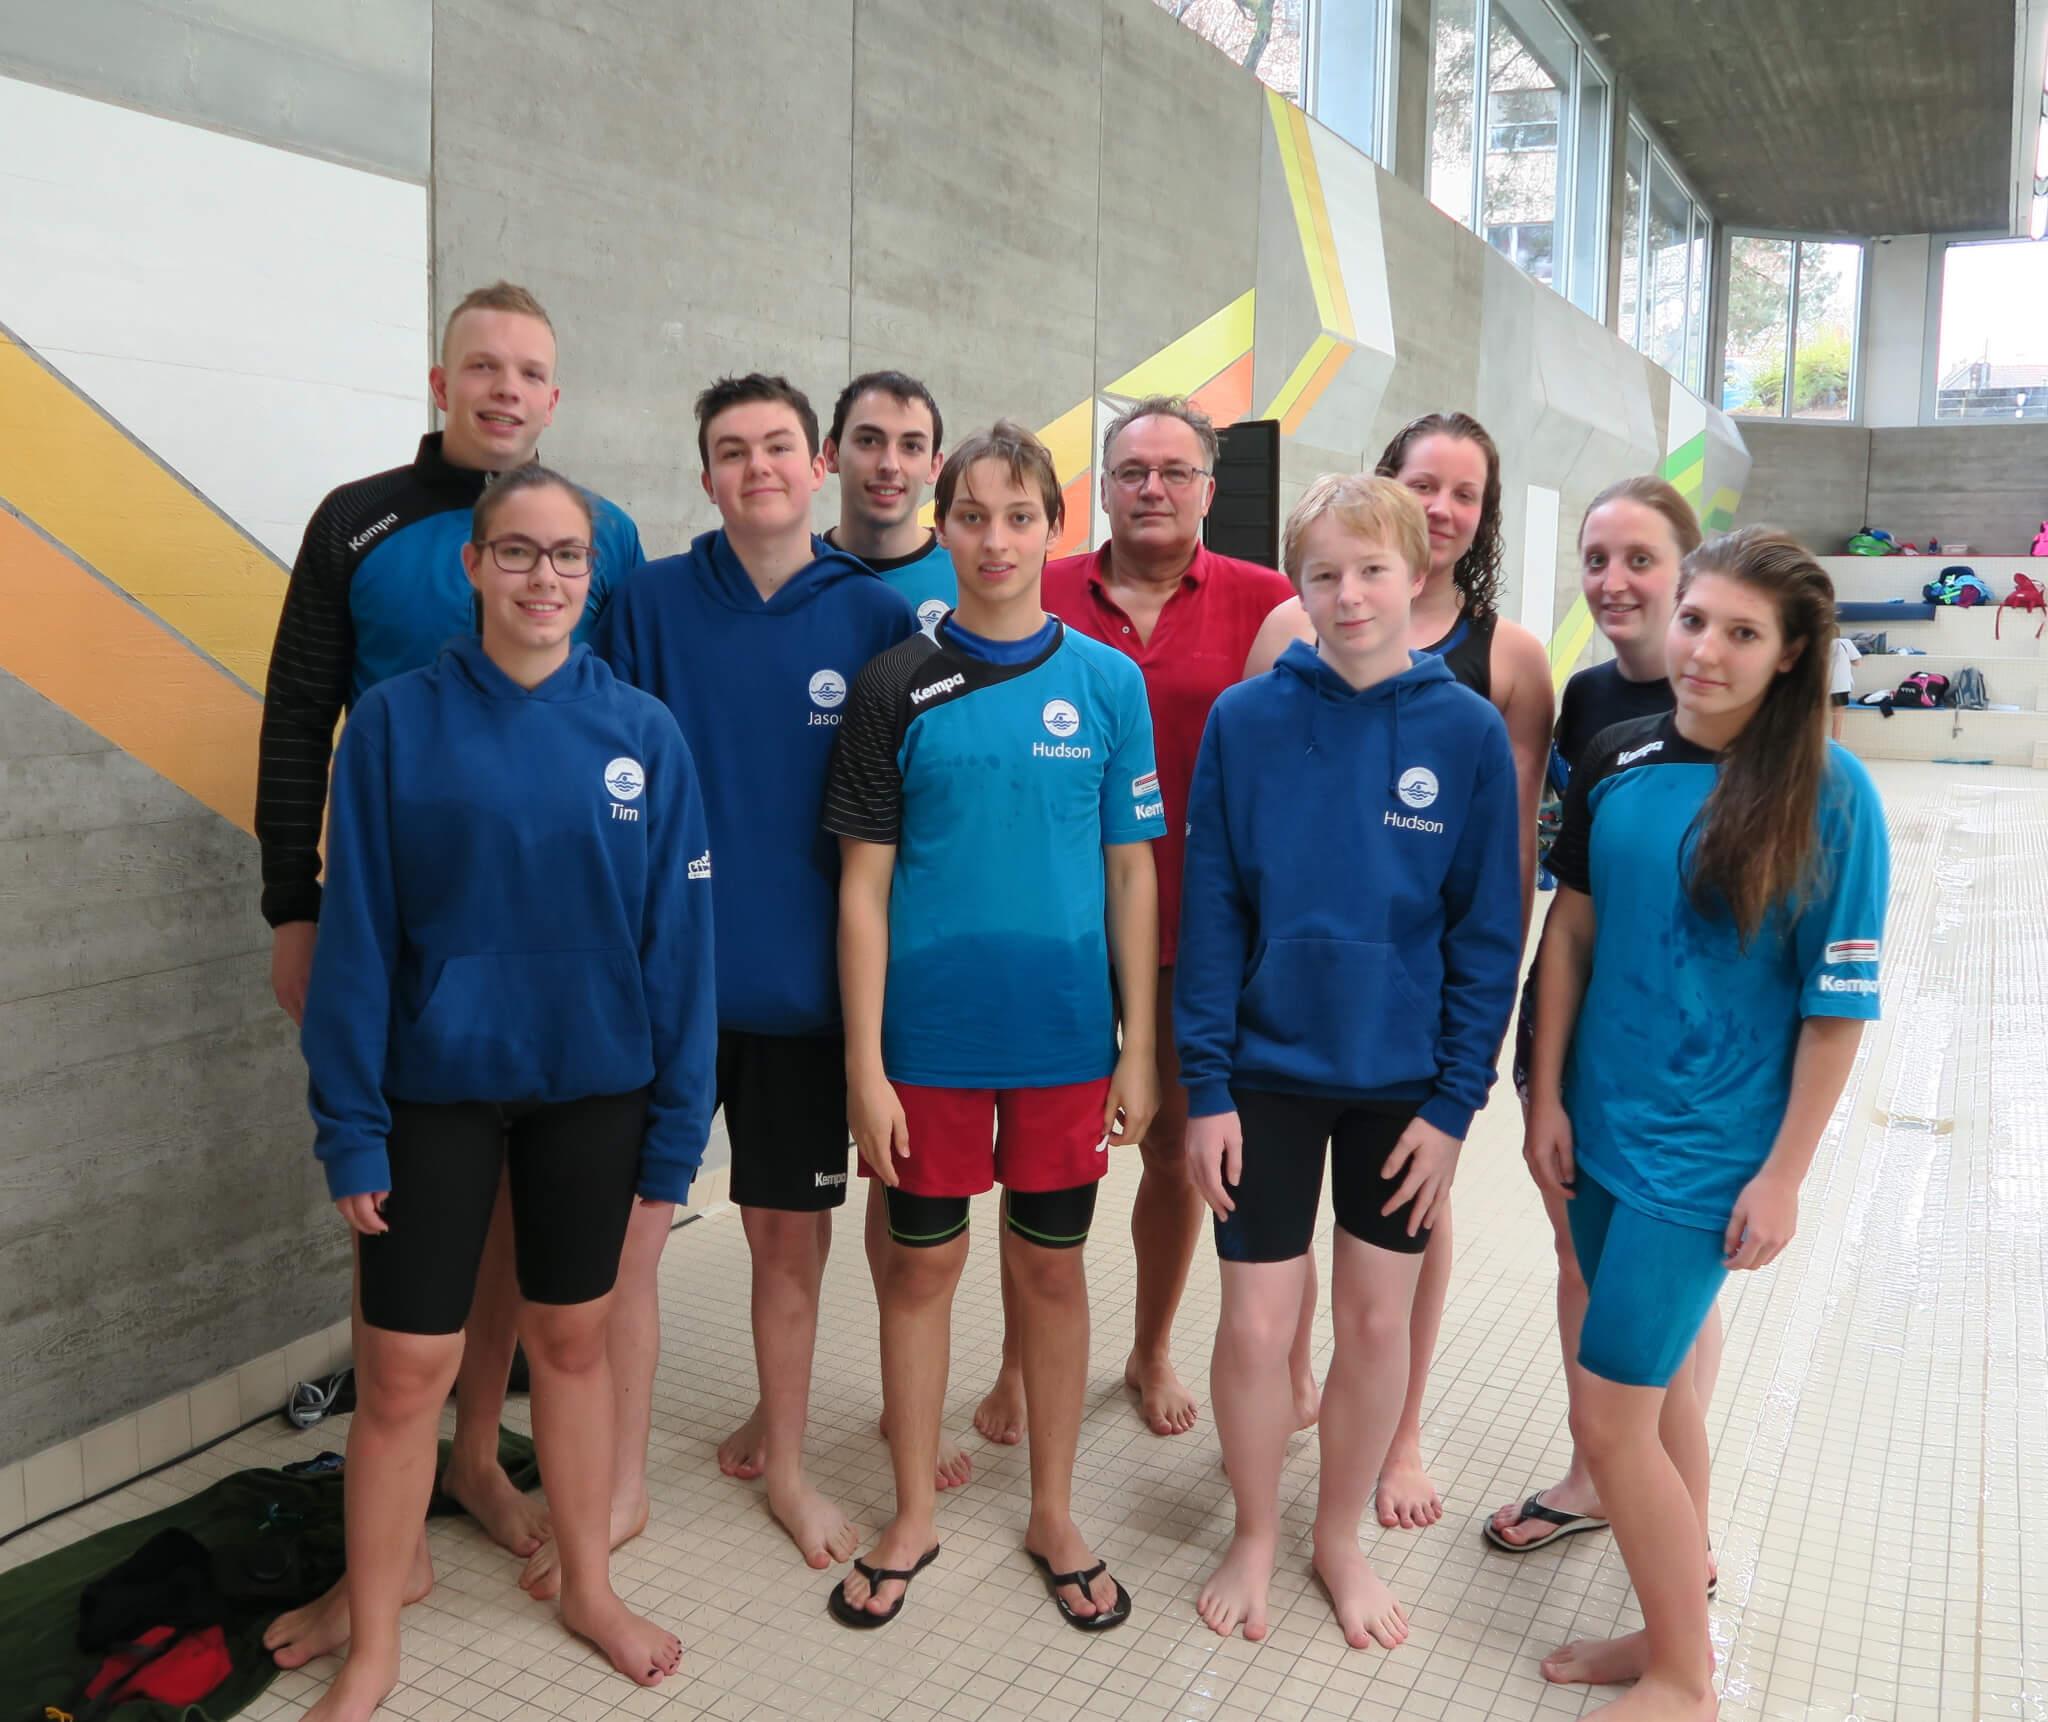 Bericht: Aarau-Open, Delémont, RZW und Clubmeisterschaften